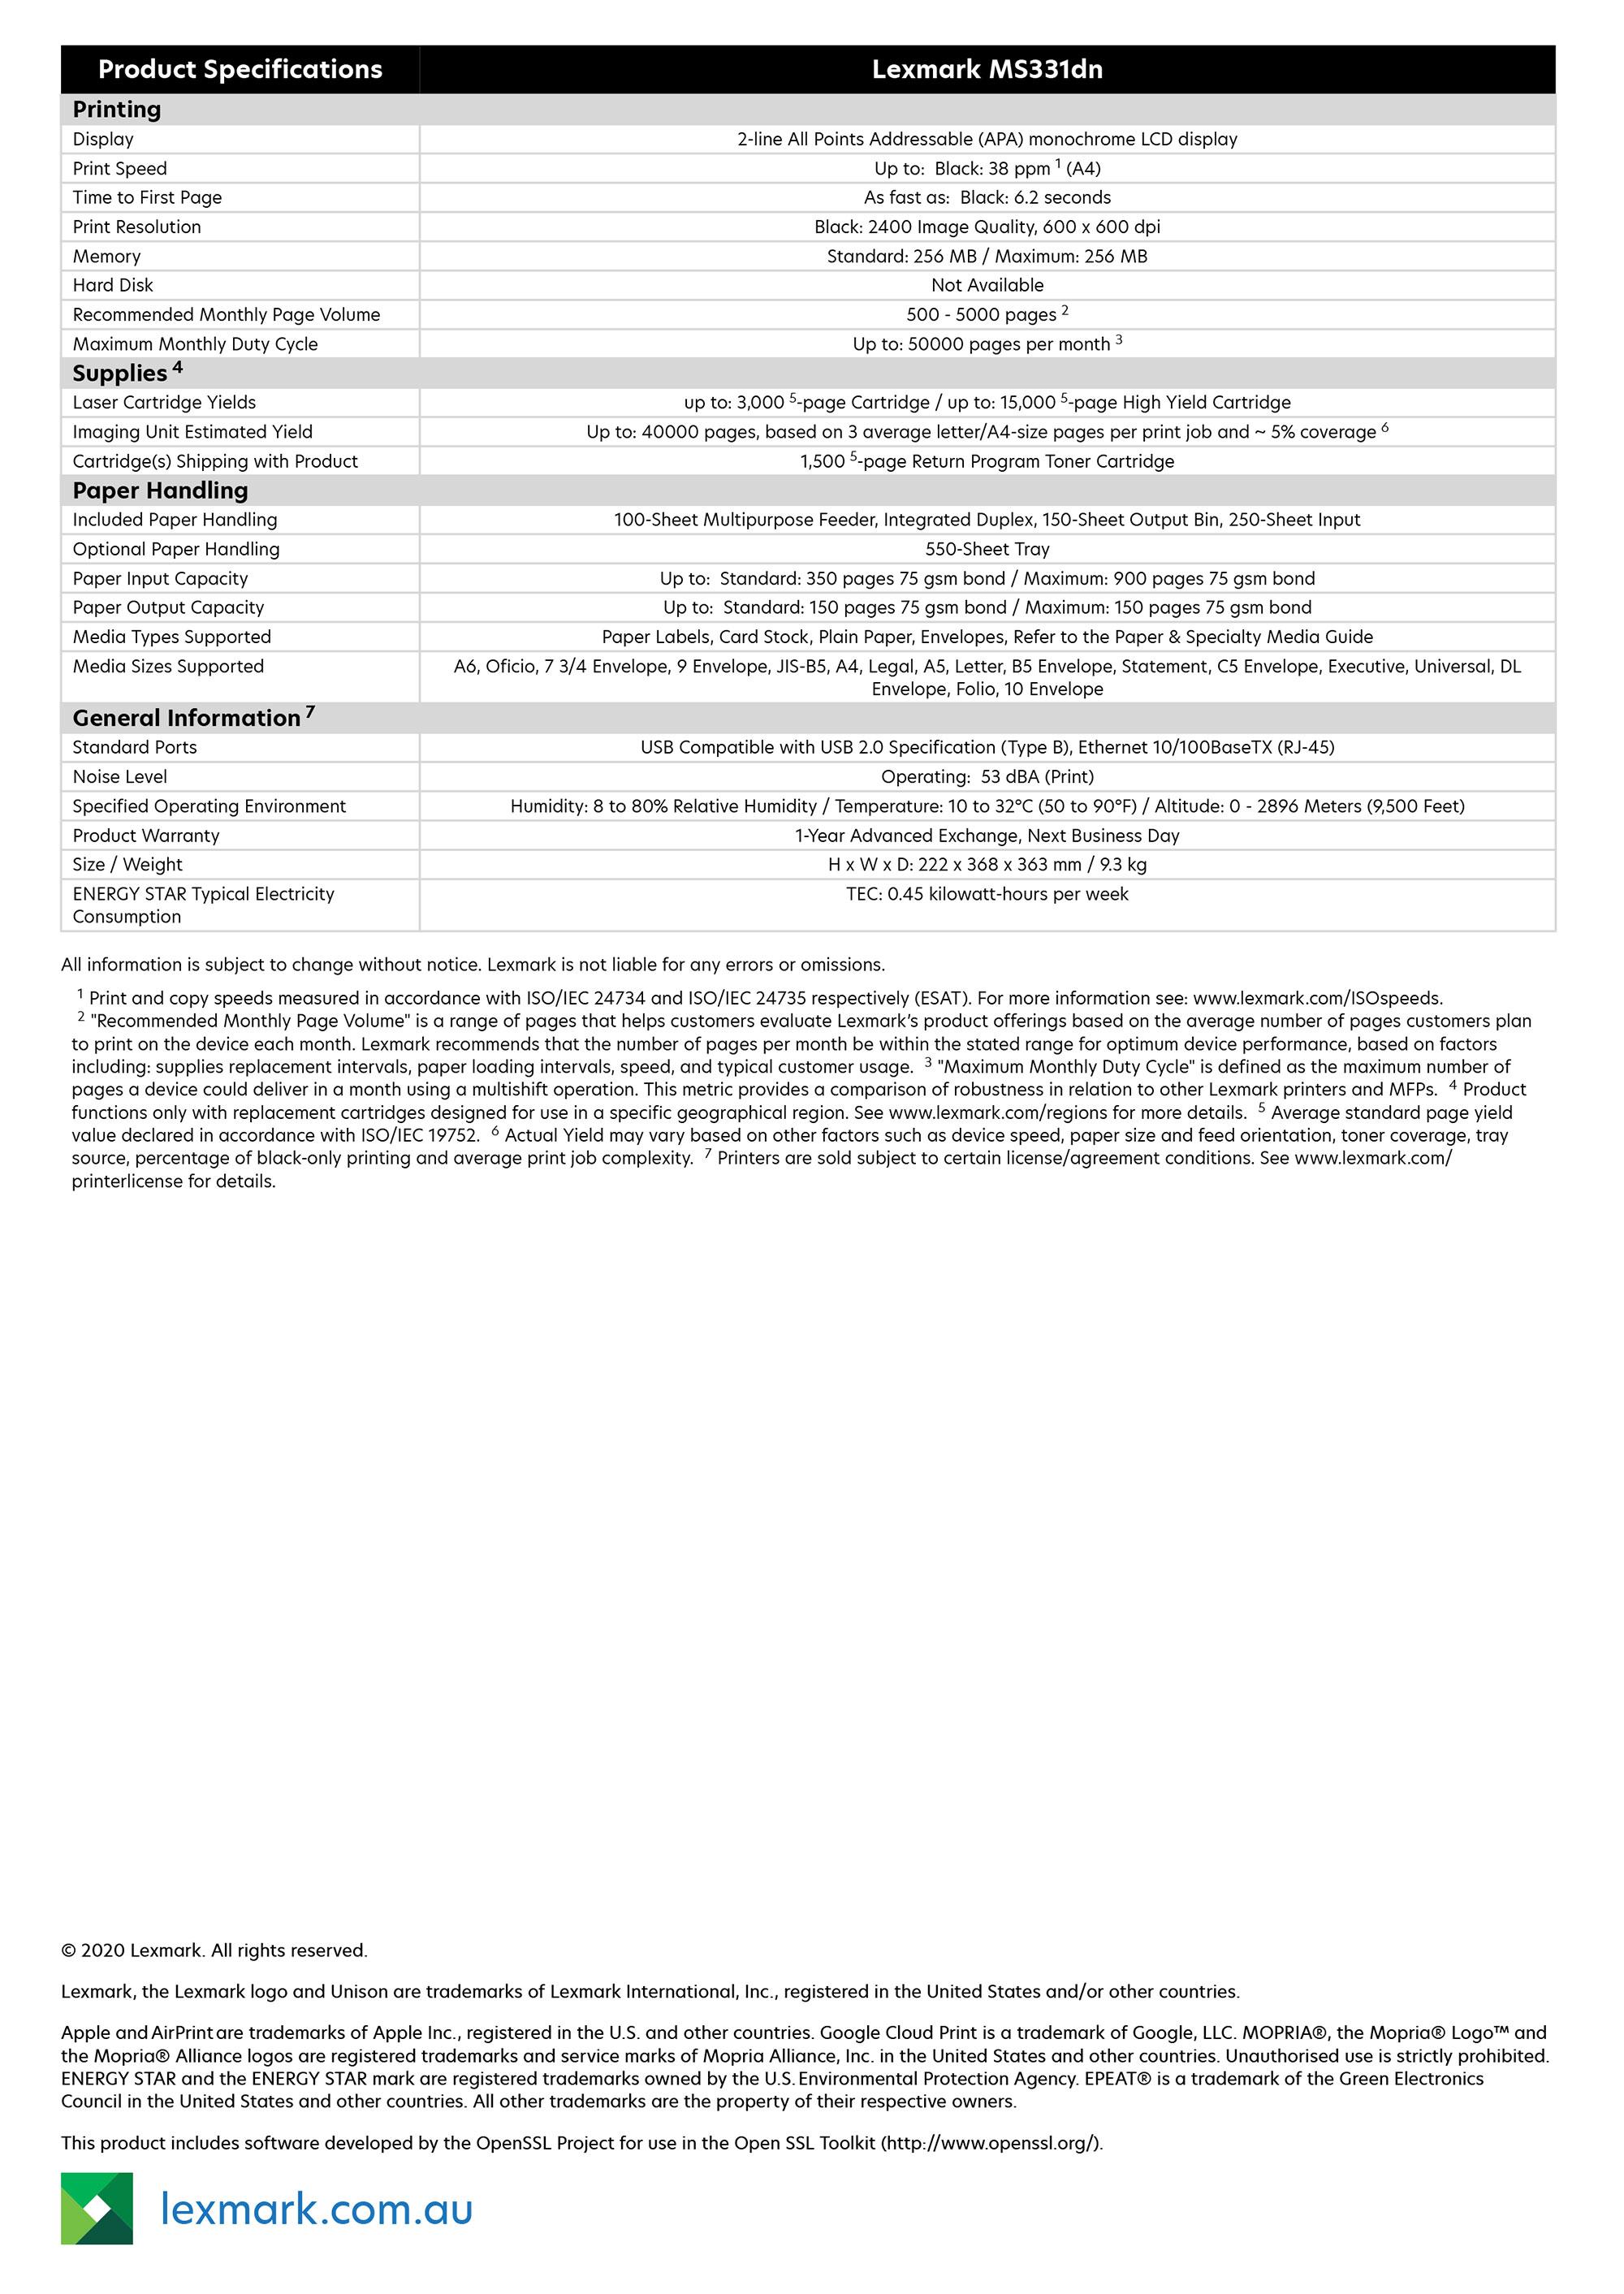 Lexmark MS331dn specs